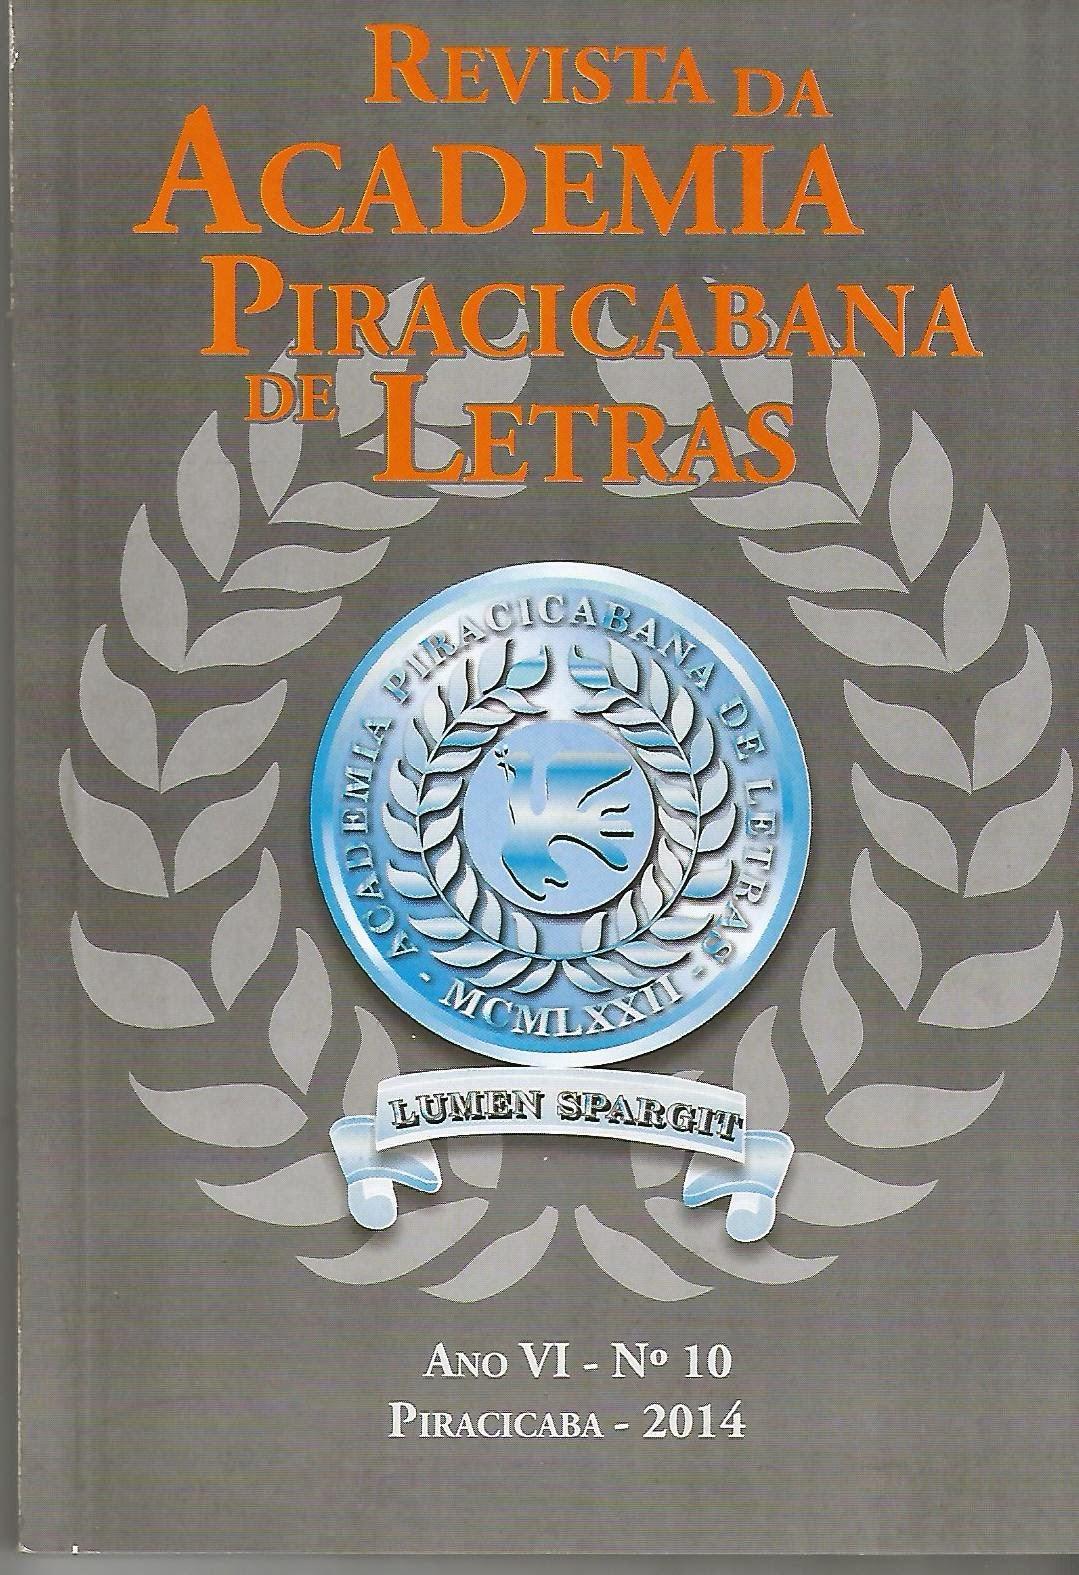 Revista da Academia Piracicabana de Letras - vol 10